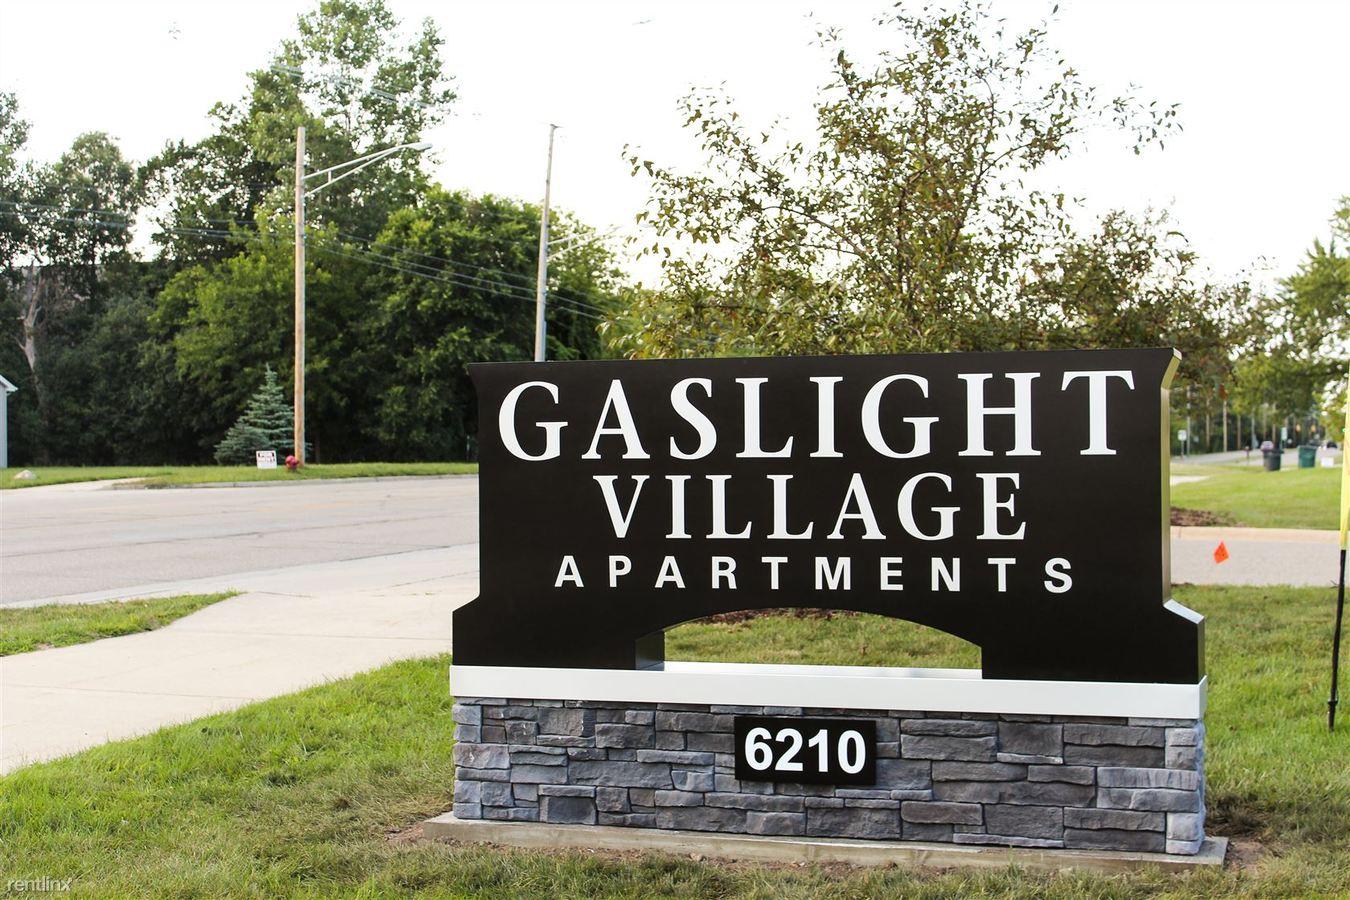 2 Bedrooms 2 Bathrooms Apartment for rent at Gaslight Village in East Lansing, MI